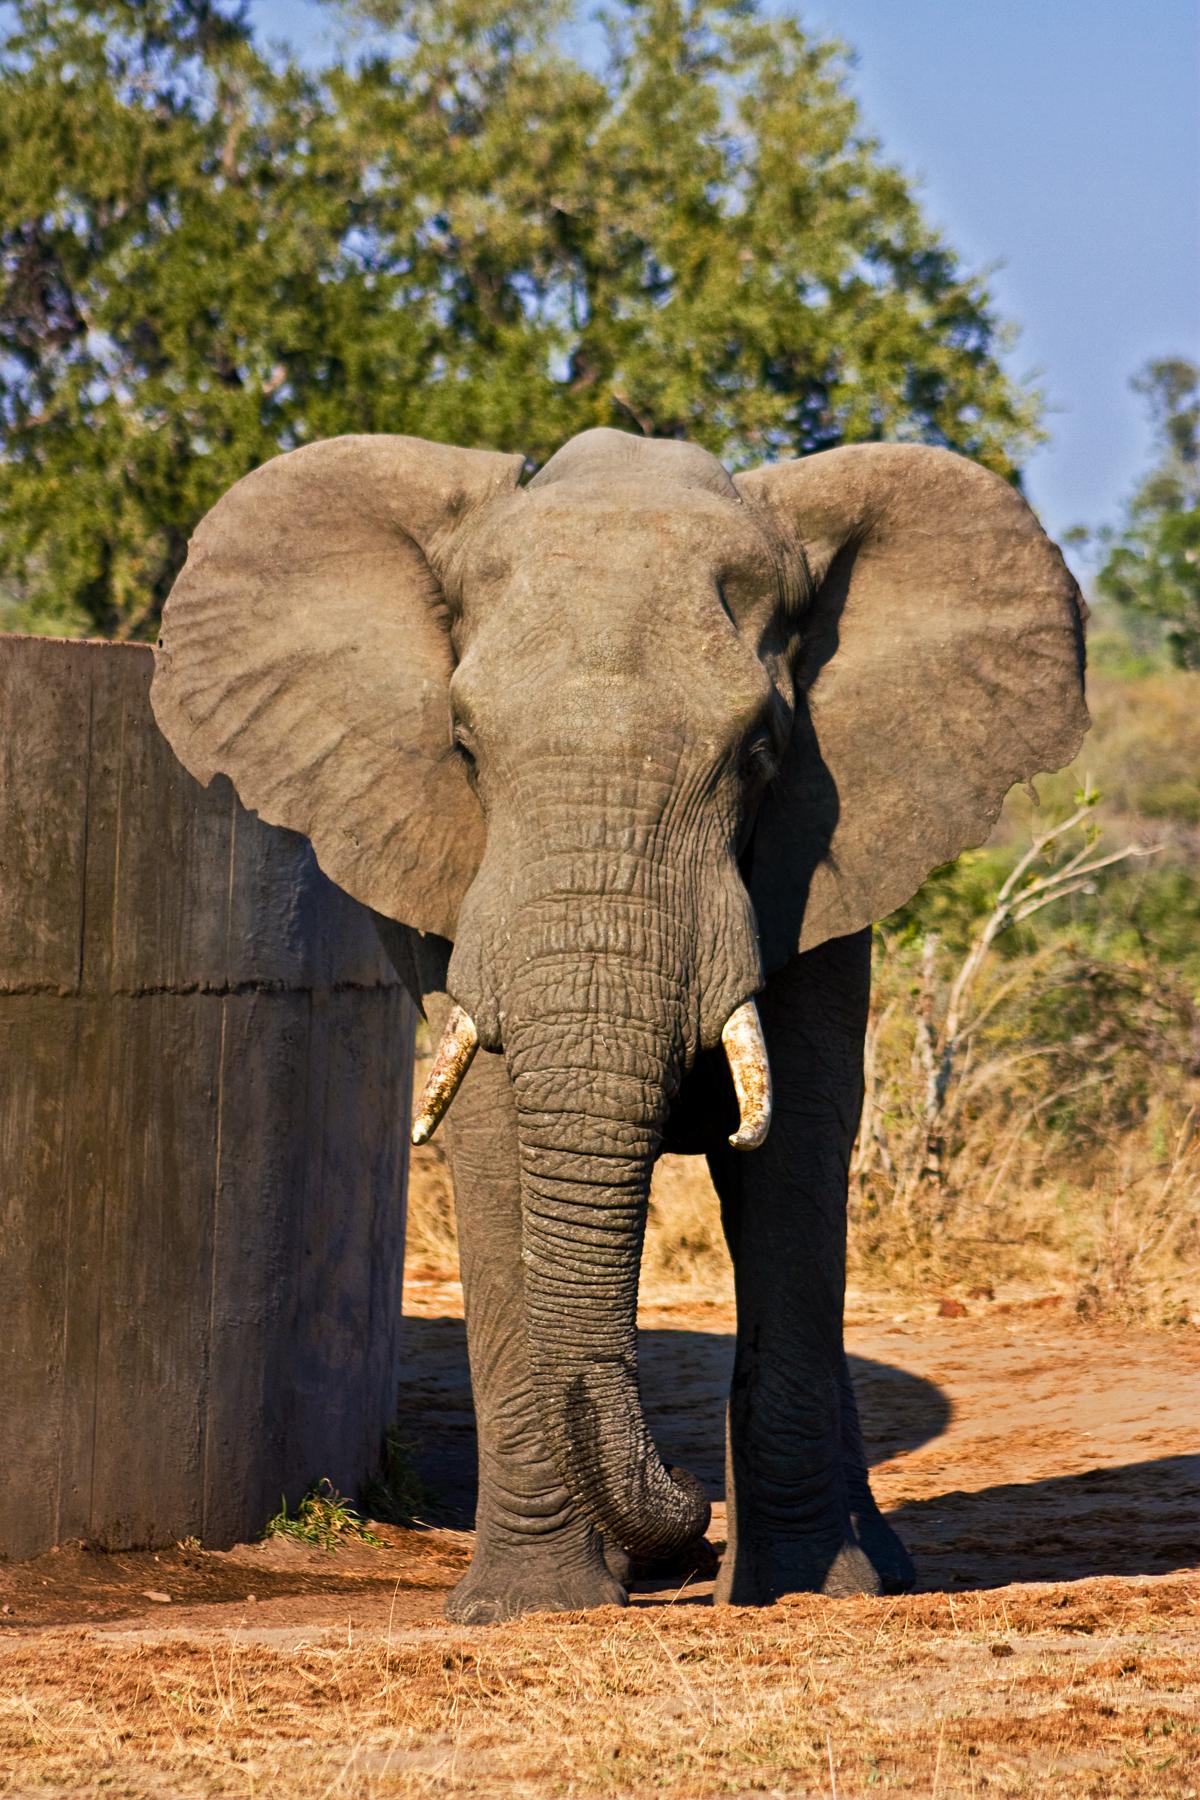 Kruger Park Elephant, Africa, Stock, Photo, Photograph, HQ Photo